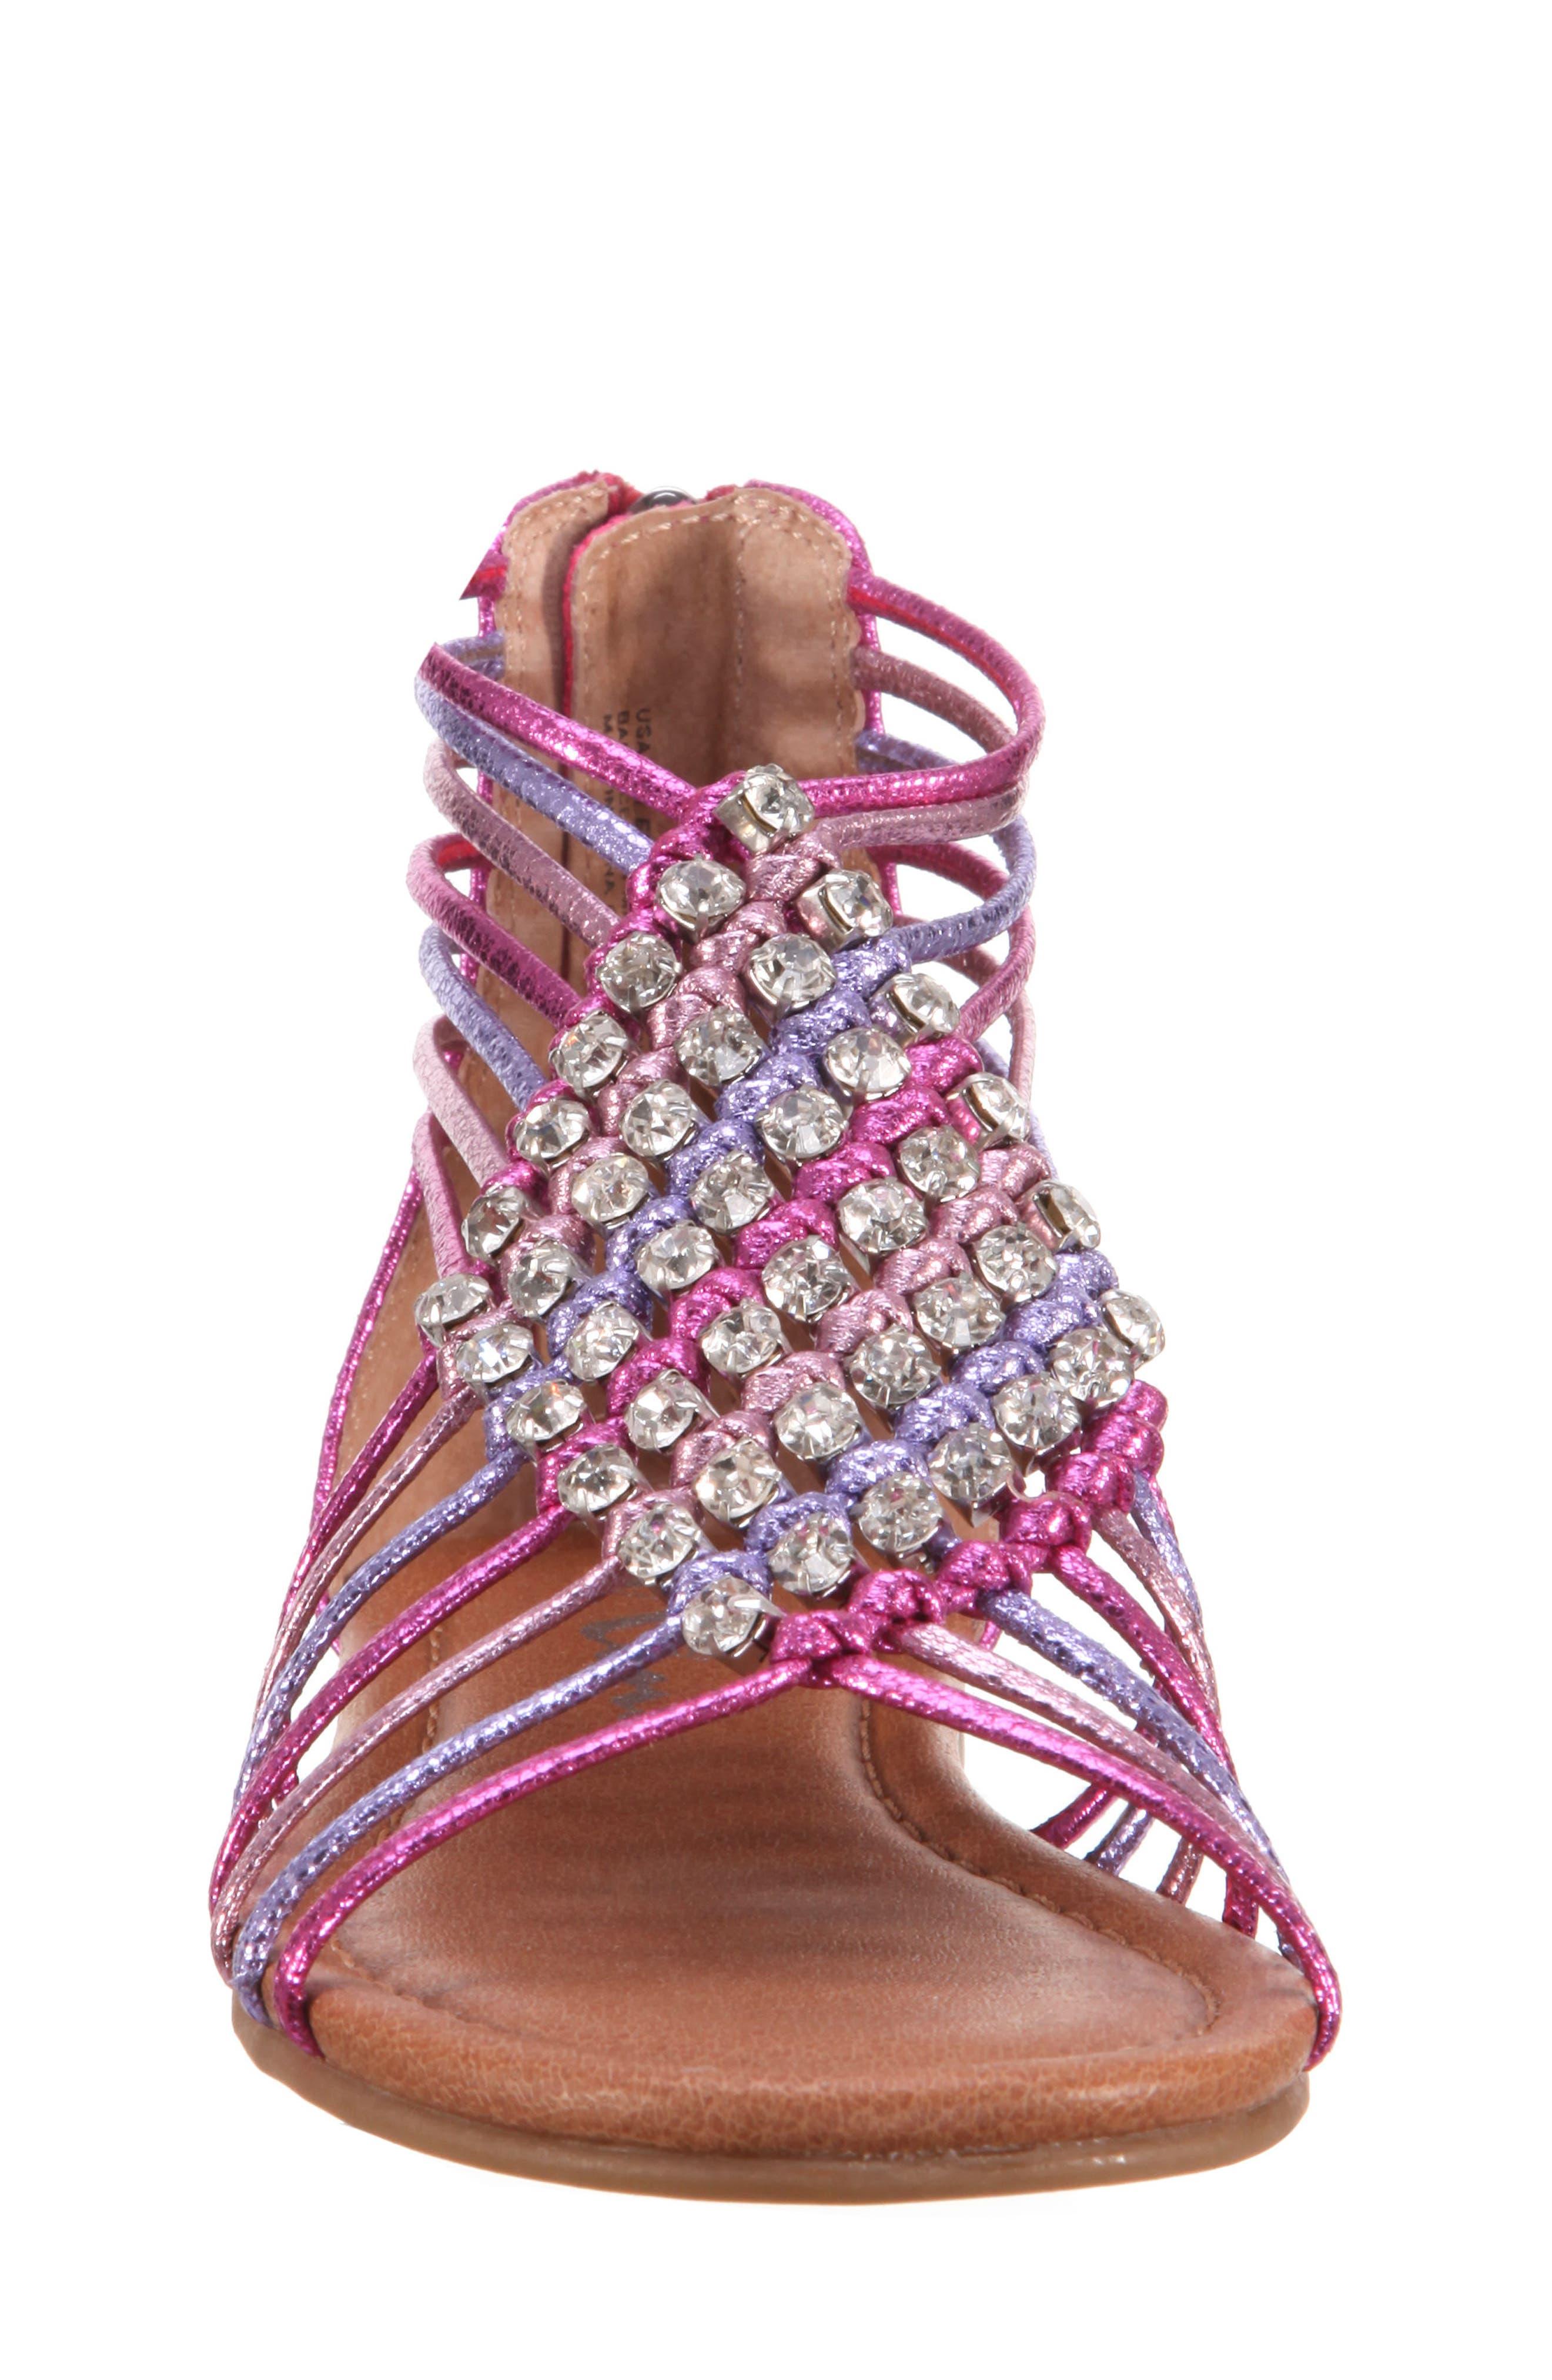 Karlee Embellished Sandal,                             Alternate thumbnail 4, color,                             Pink Multi Metallic Crackle